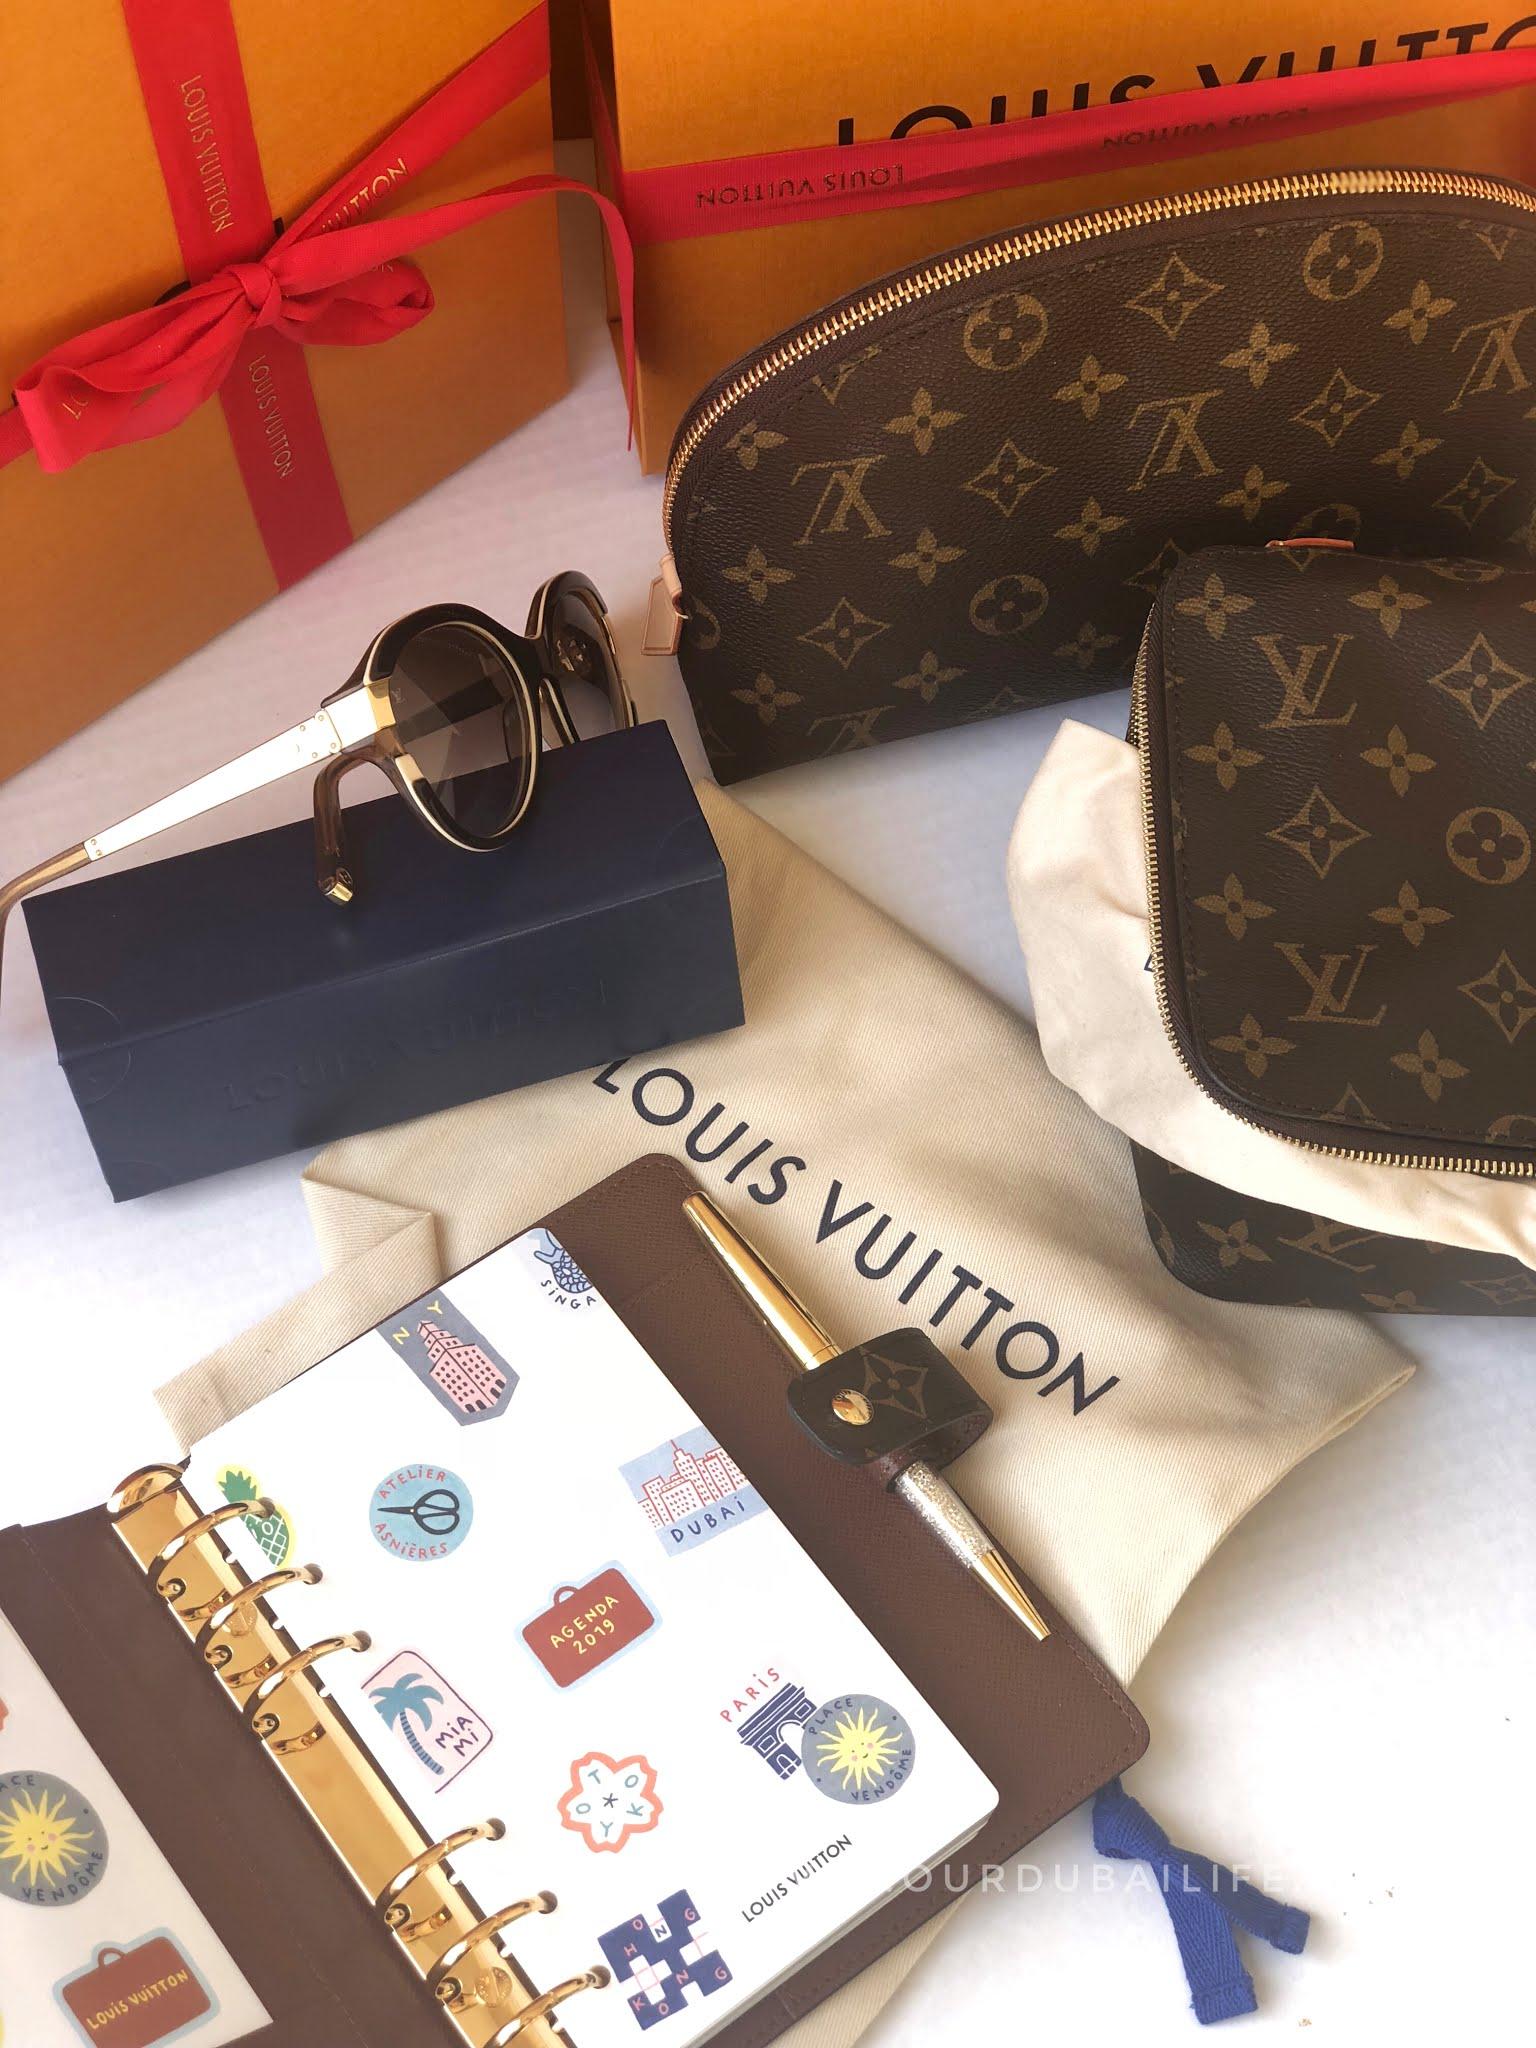 Luxury XMAS presents sunglasses cosmetic bag and agenda